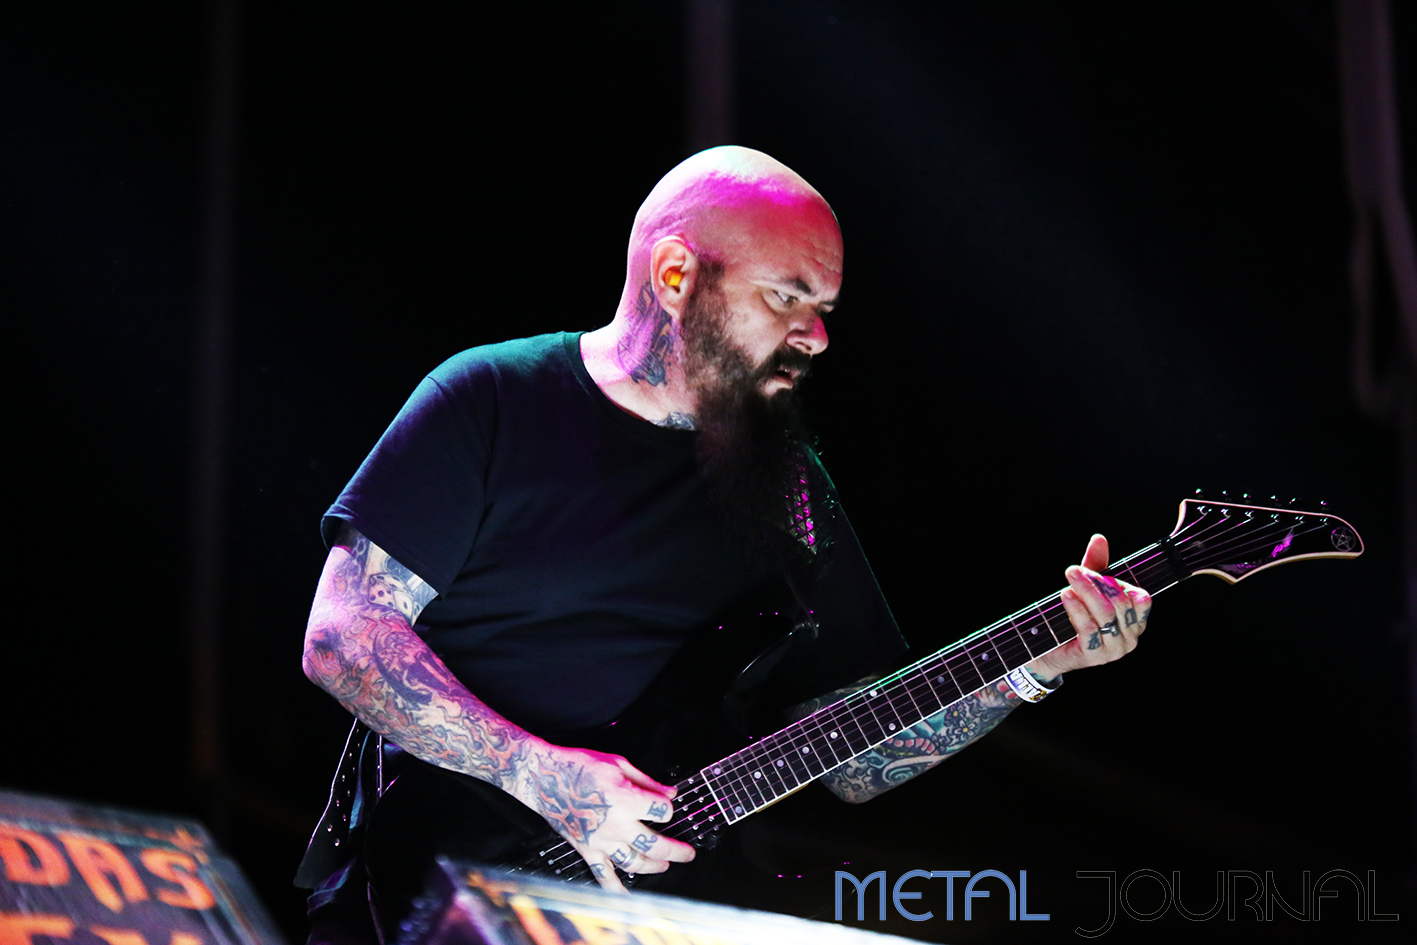 deicide - leyendas del rock 2019 metal journal pic 2